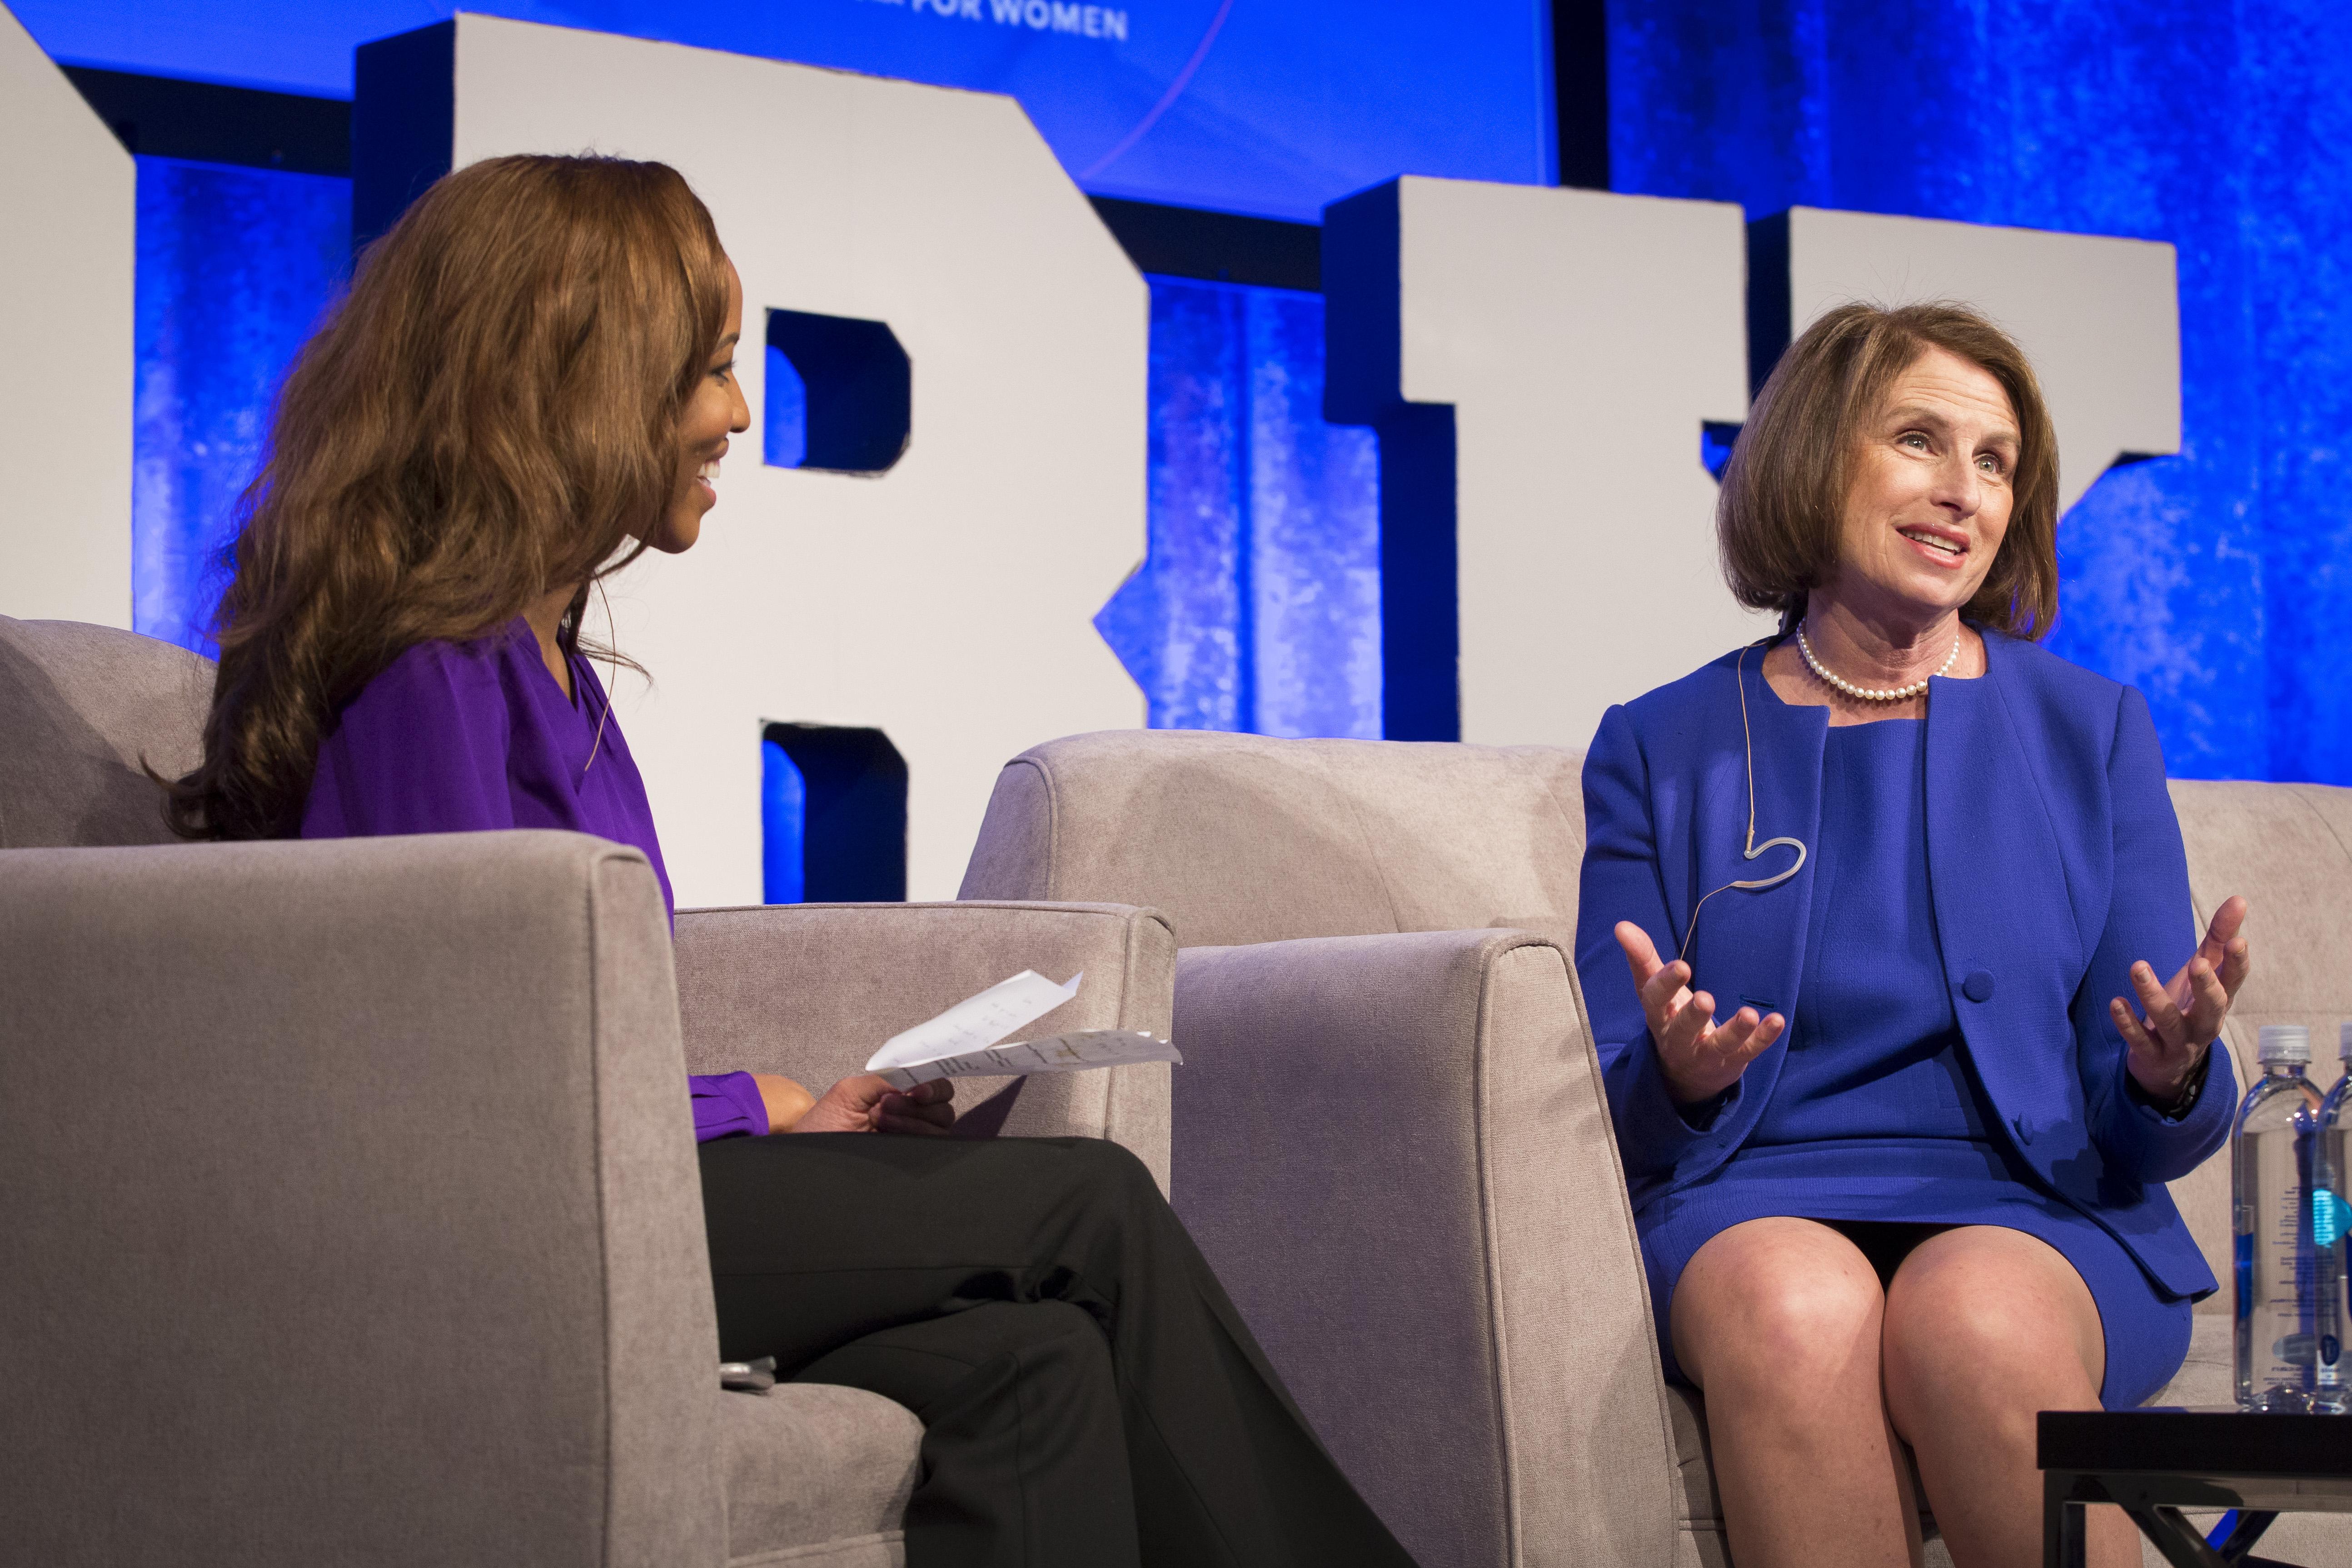 CNN International's Zain Asher interviews Catalyst President & CEO Lorraine Hariton.